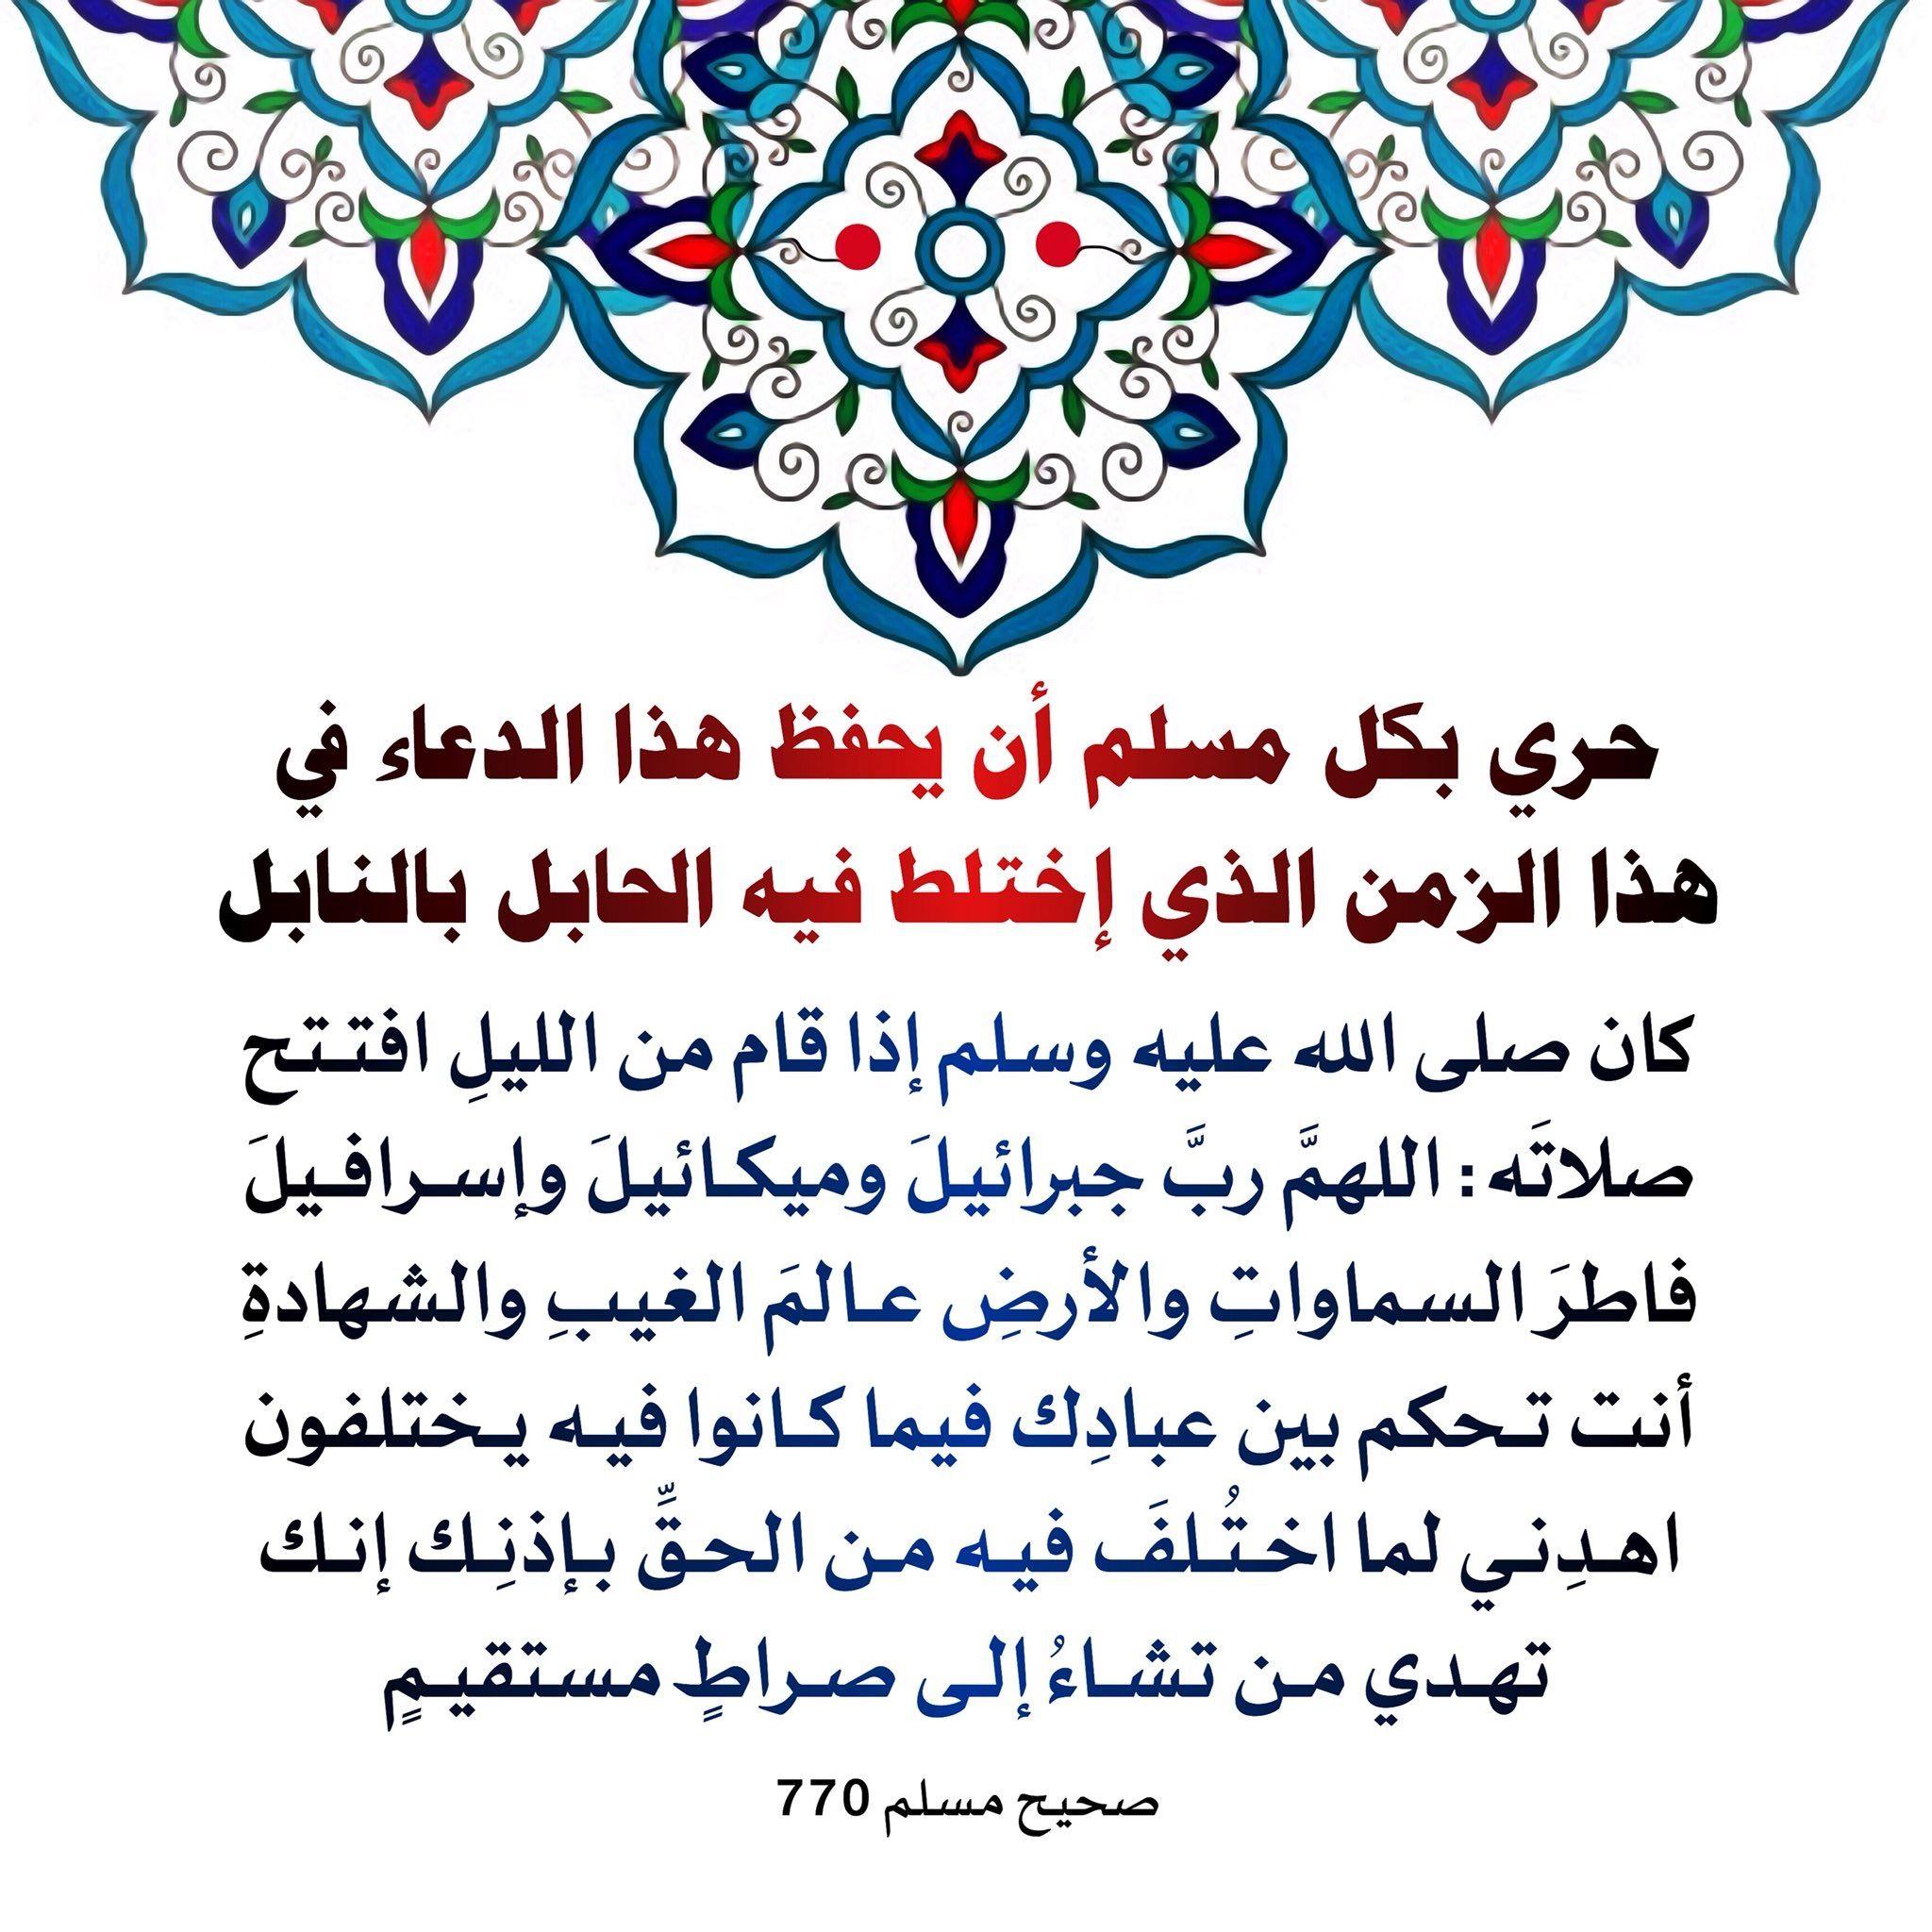 Pin By Abd0urrahmane On معلومات دينية Aesthetic Iphone Wallpaper Hadith Sharif Hadith